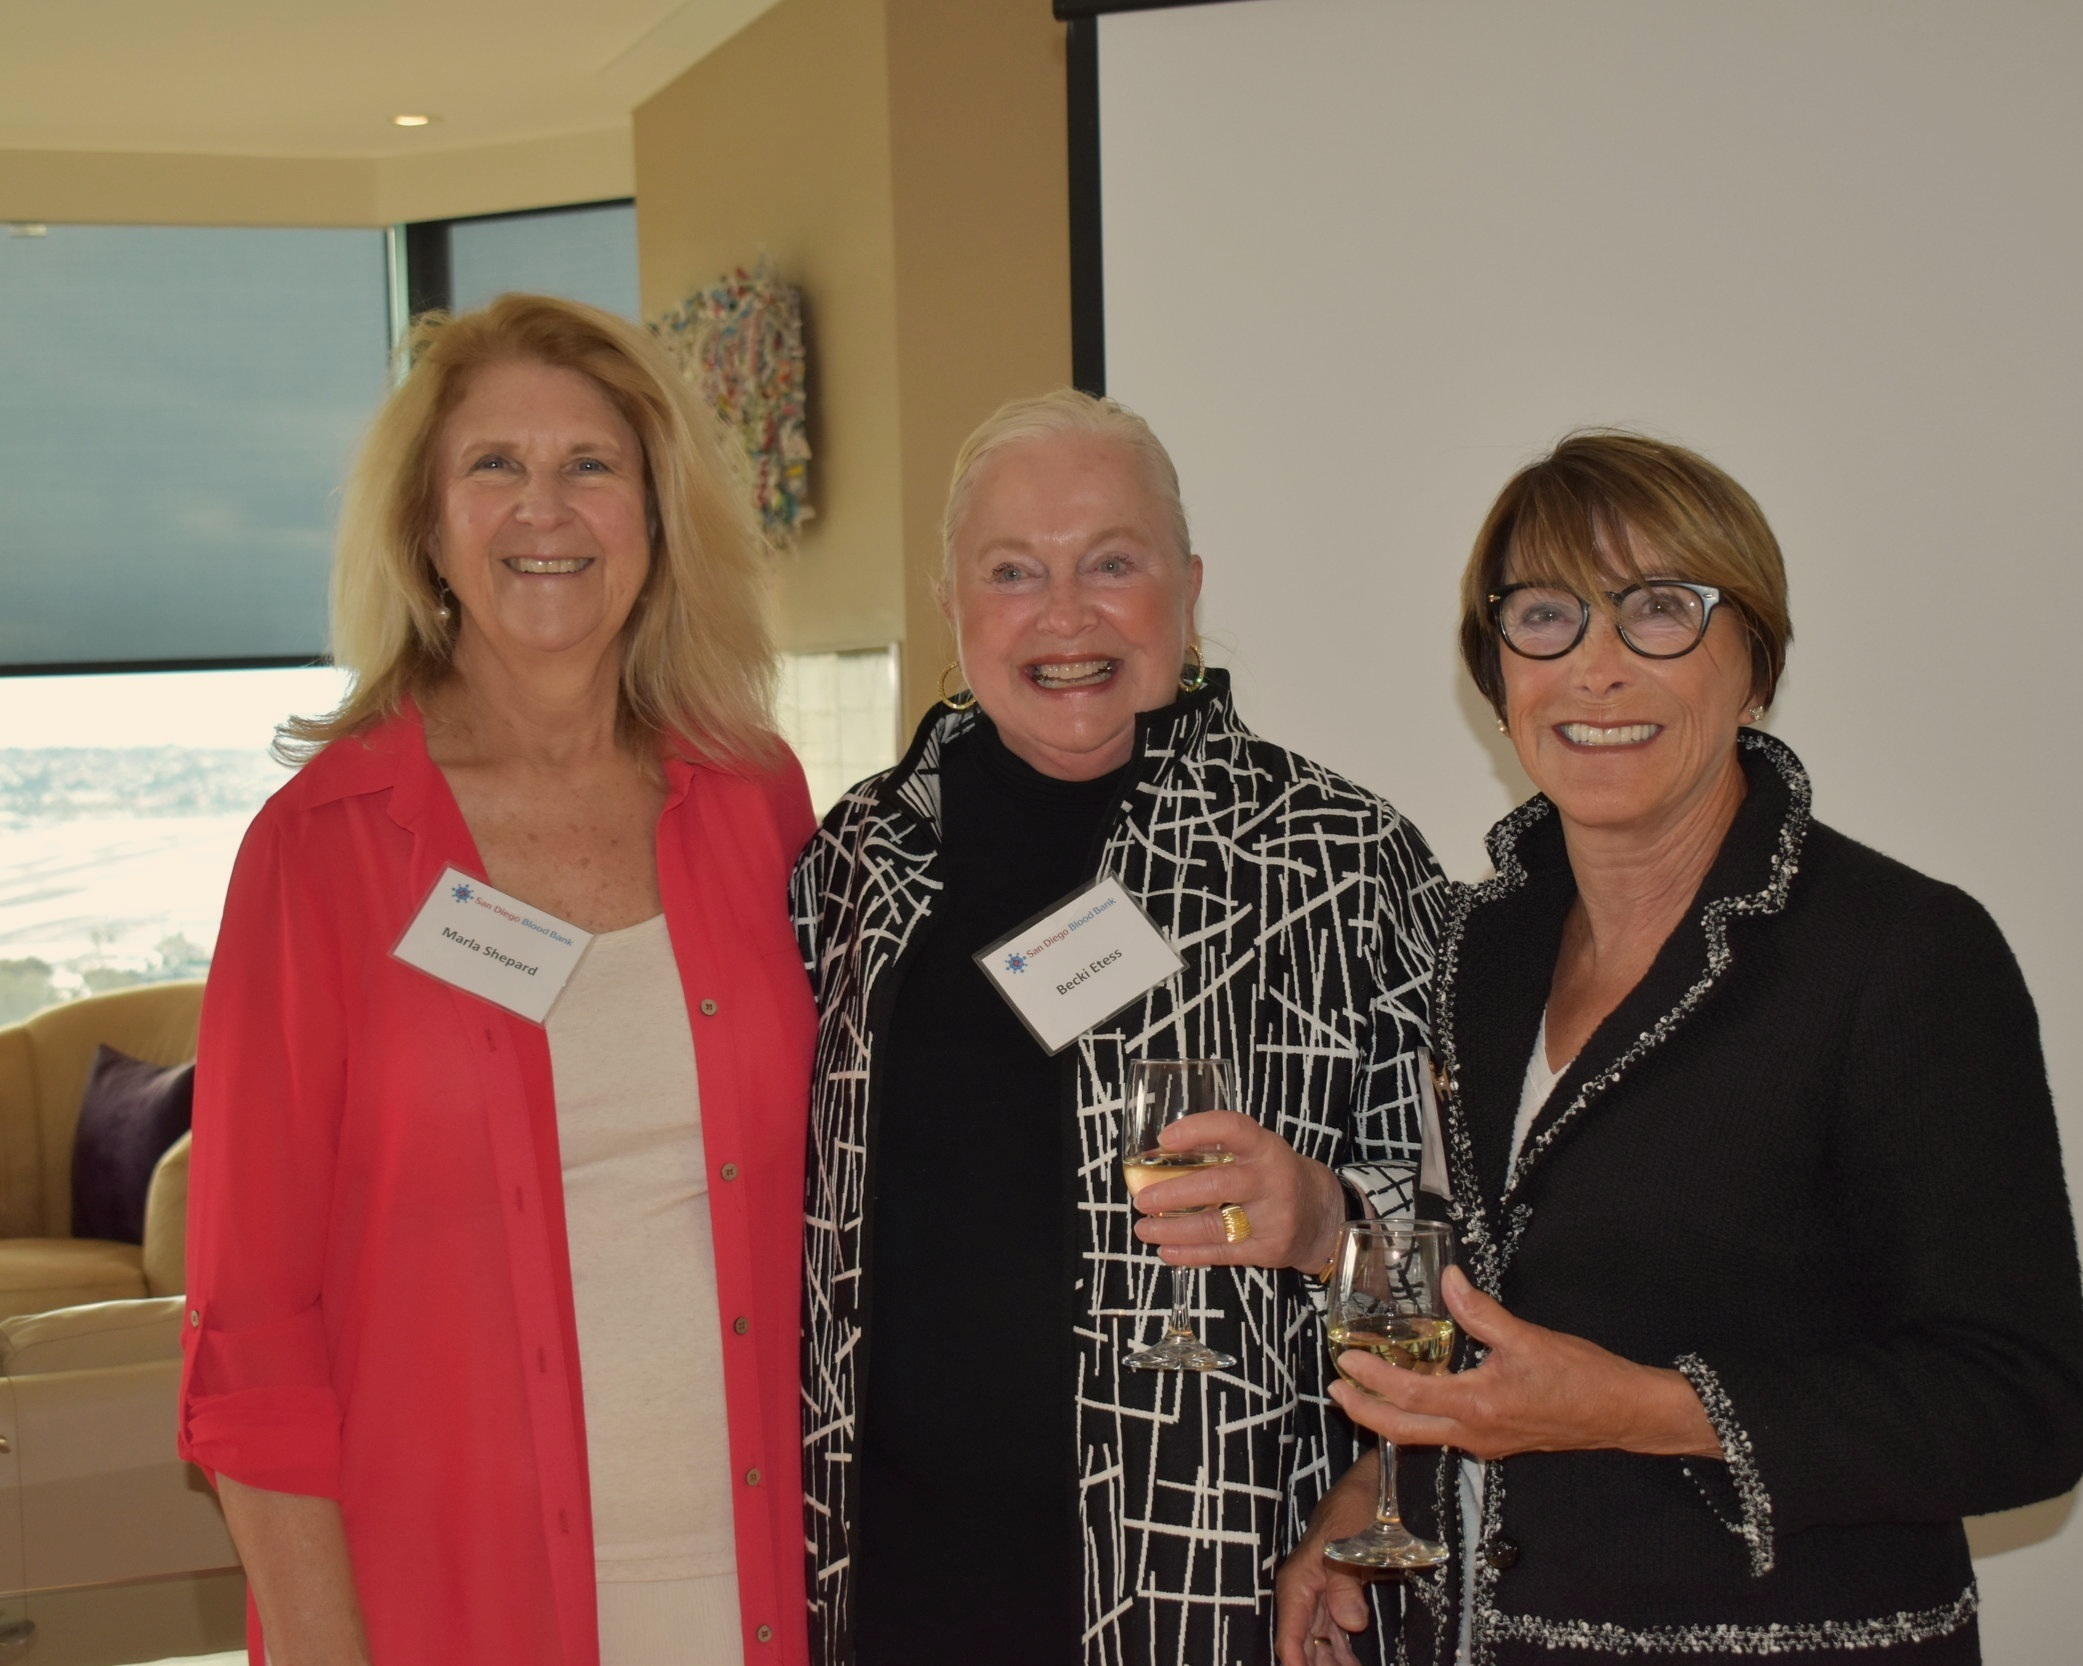 Marla Shepard, Becki Etess, and Karen Ludwig